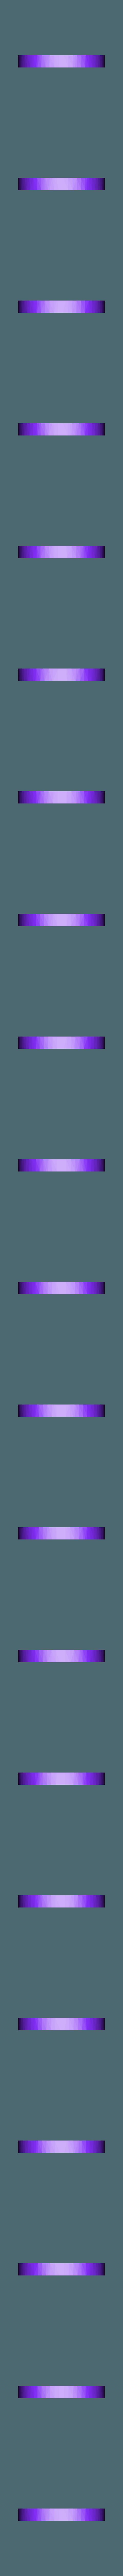 Cap, Hidden Symbol Iris Ring.STL Download free STL file Hidden Symbol Iris Ring • 3D printer model, potentprintables